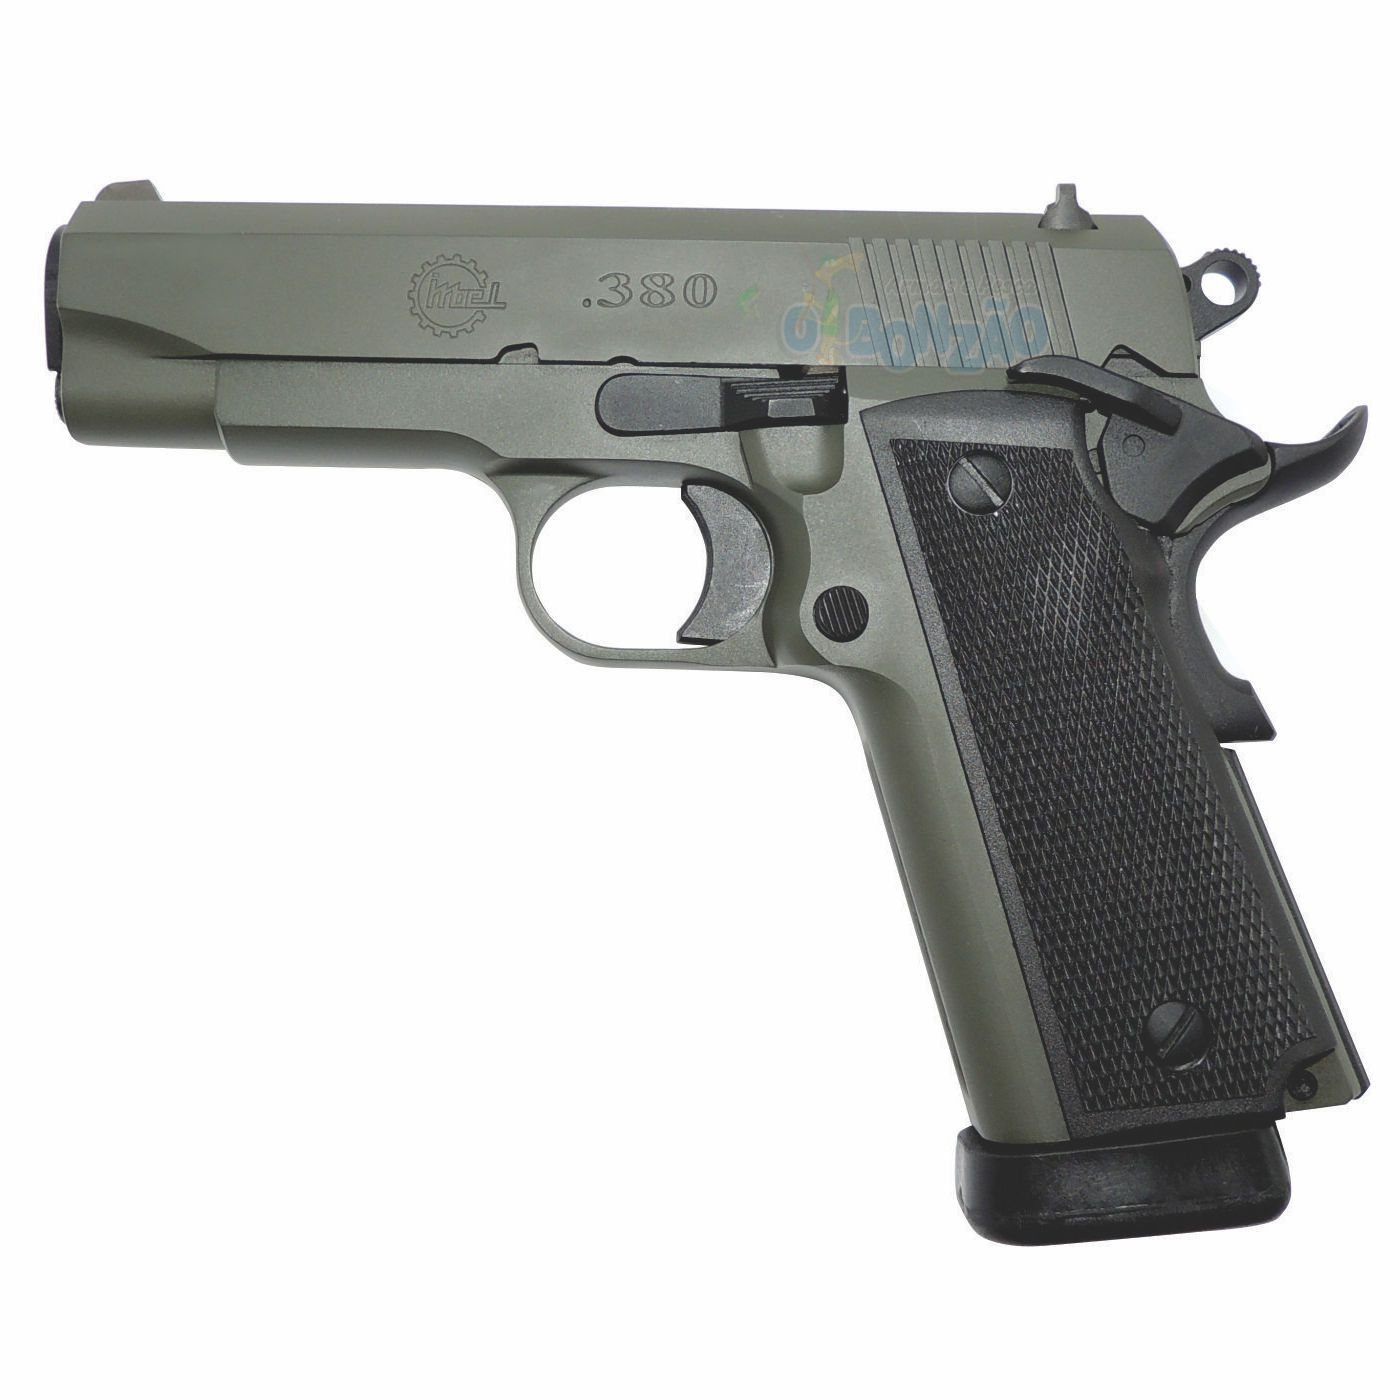 Pistola Imbel MD1 GC ADC Cal .380 ACP 19+1 Tiros Oxidada Verde